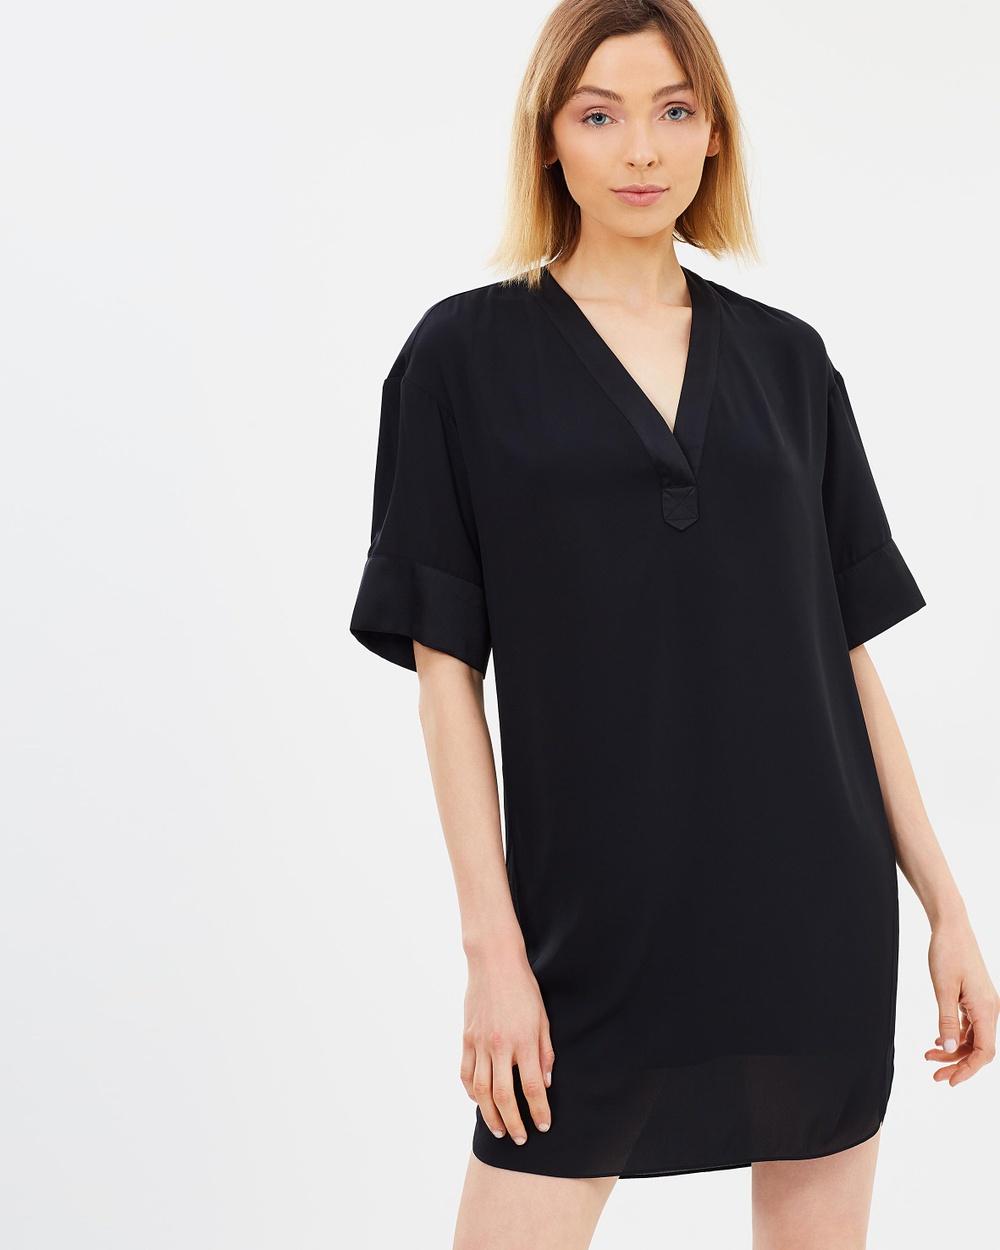 Warehouse Satin Mix Dress Dresses Black Satin Mix Dress